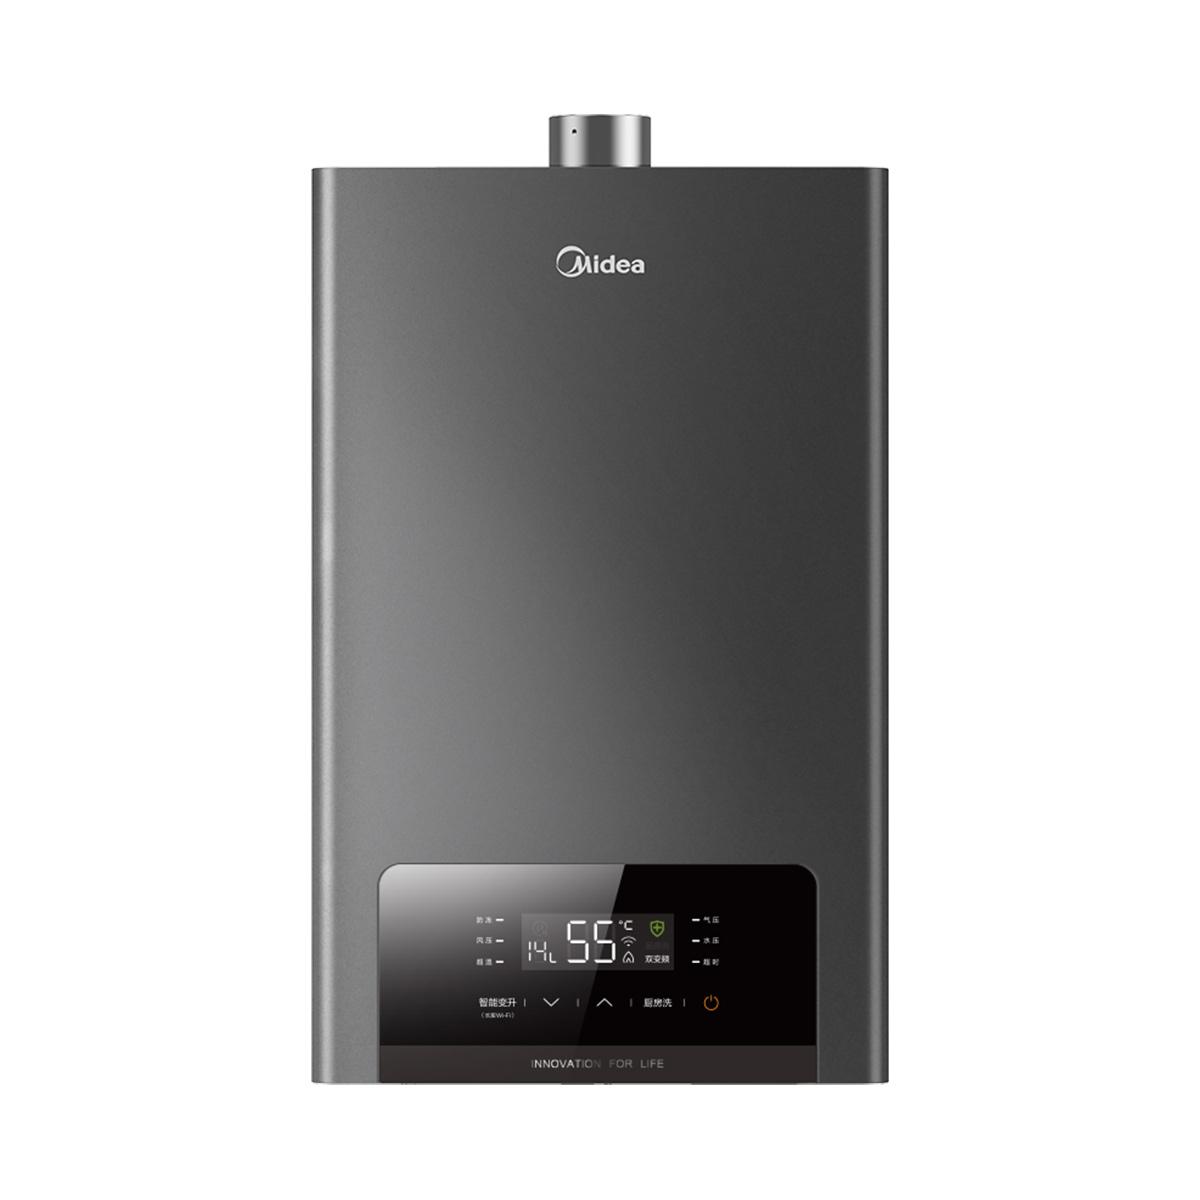 Midea/美的 JSQ27-WD7燃气热水器 说明书.pdf